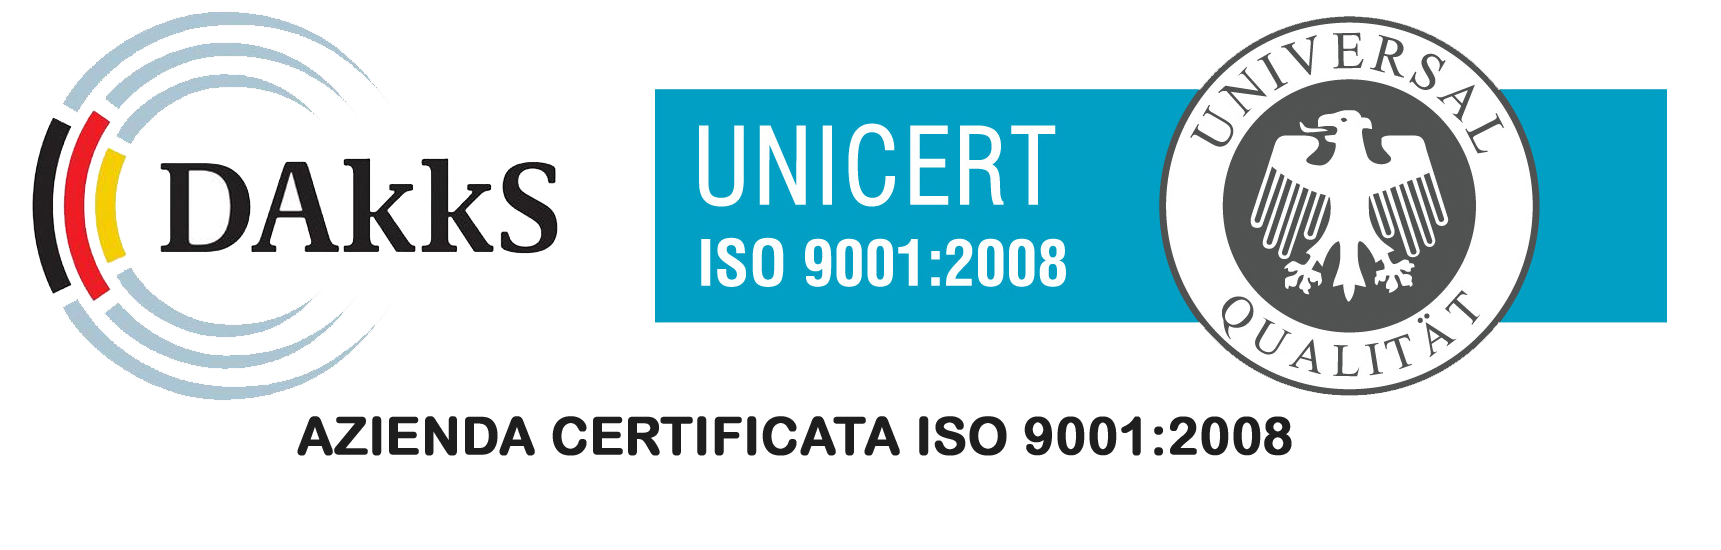 ISO 9001:2008 certification logo